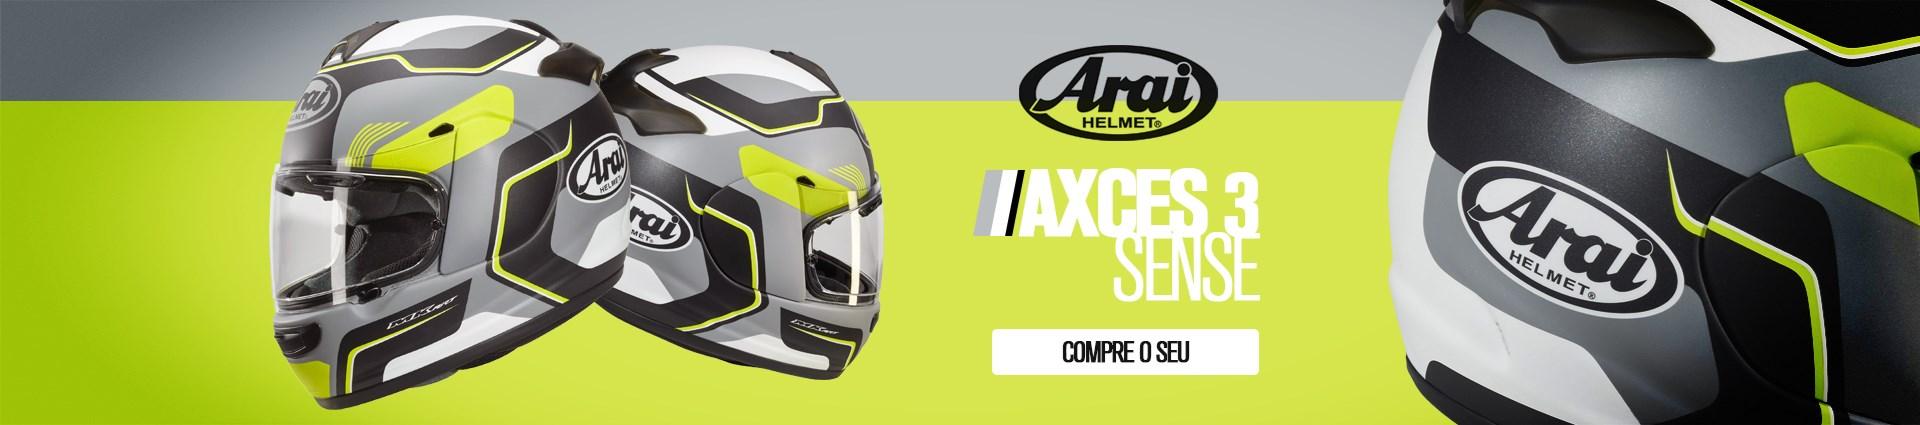 LP Arai - Axces 3 Sense